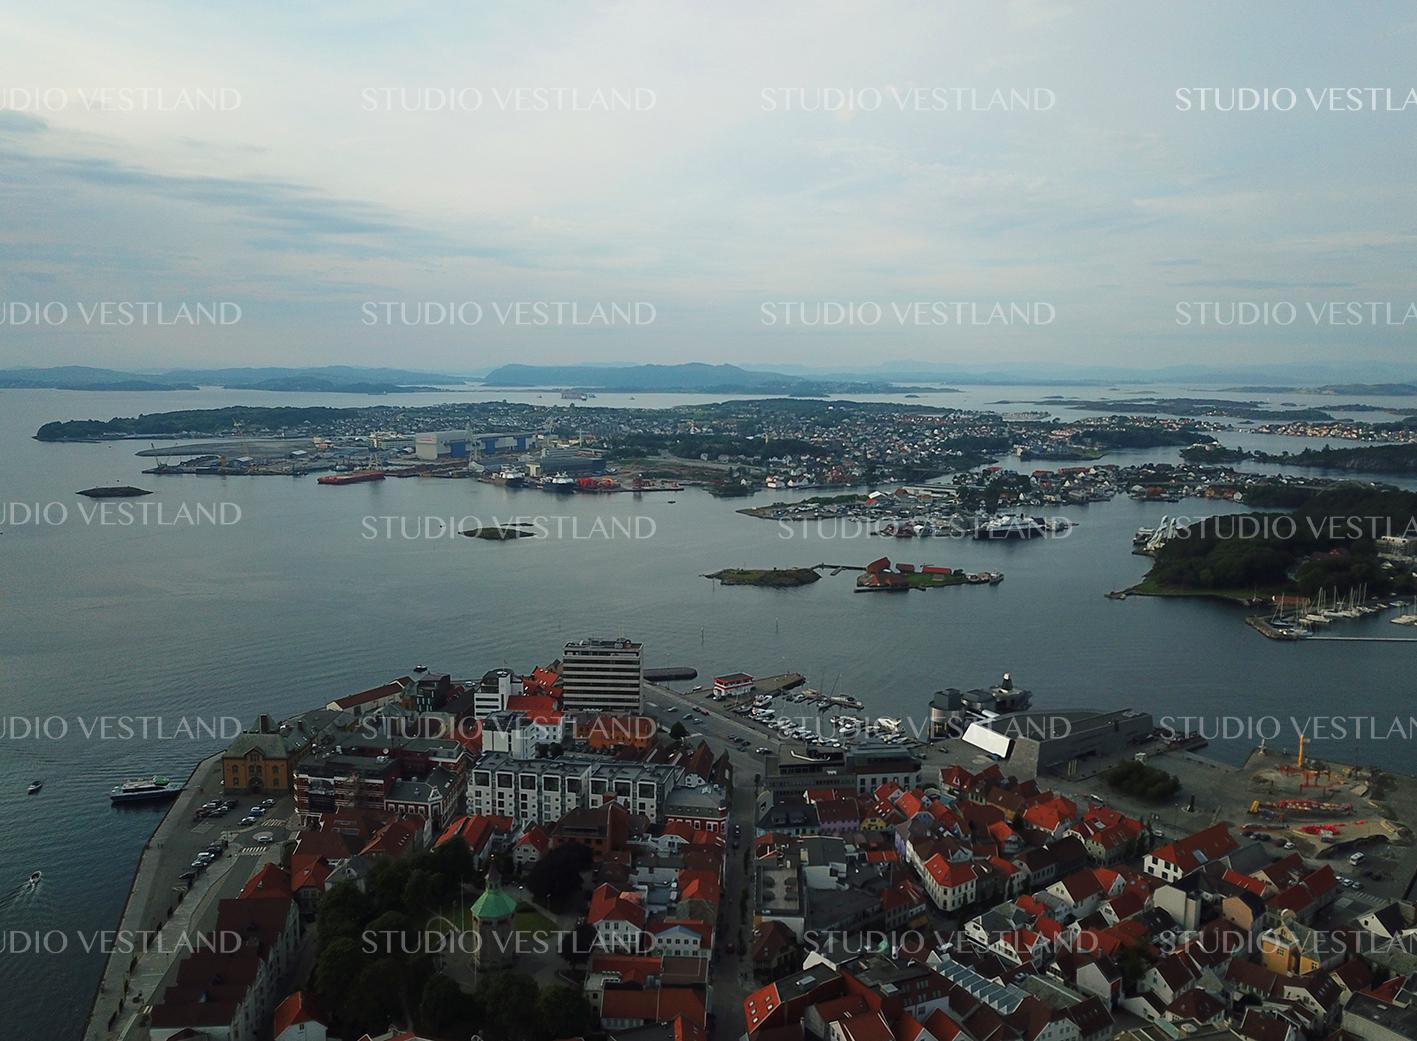 Studio Vestland - Stavanger 24